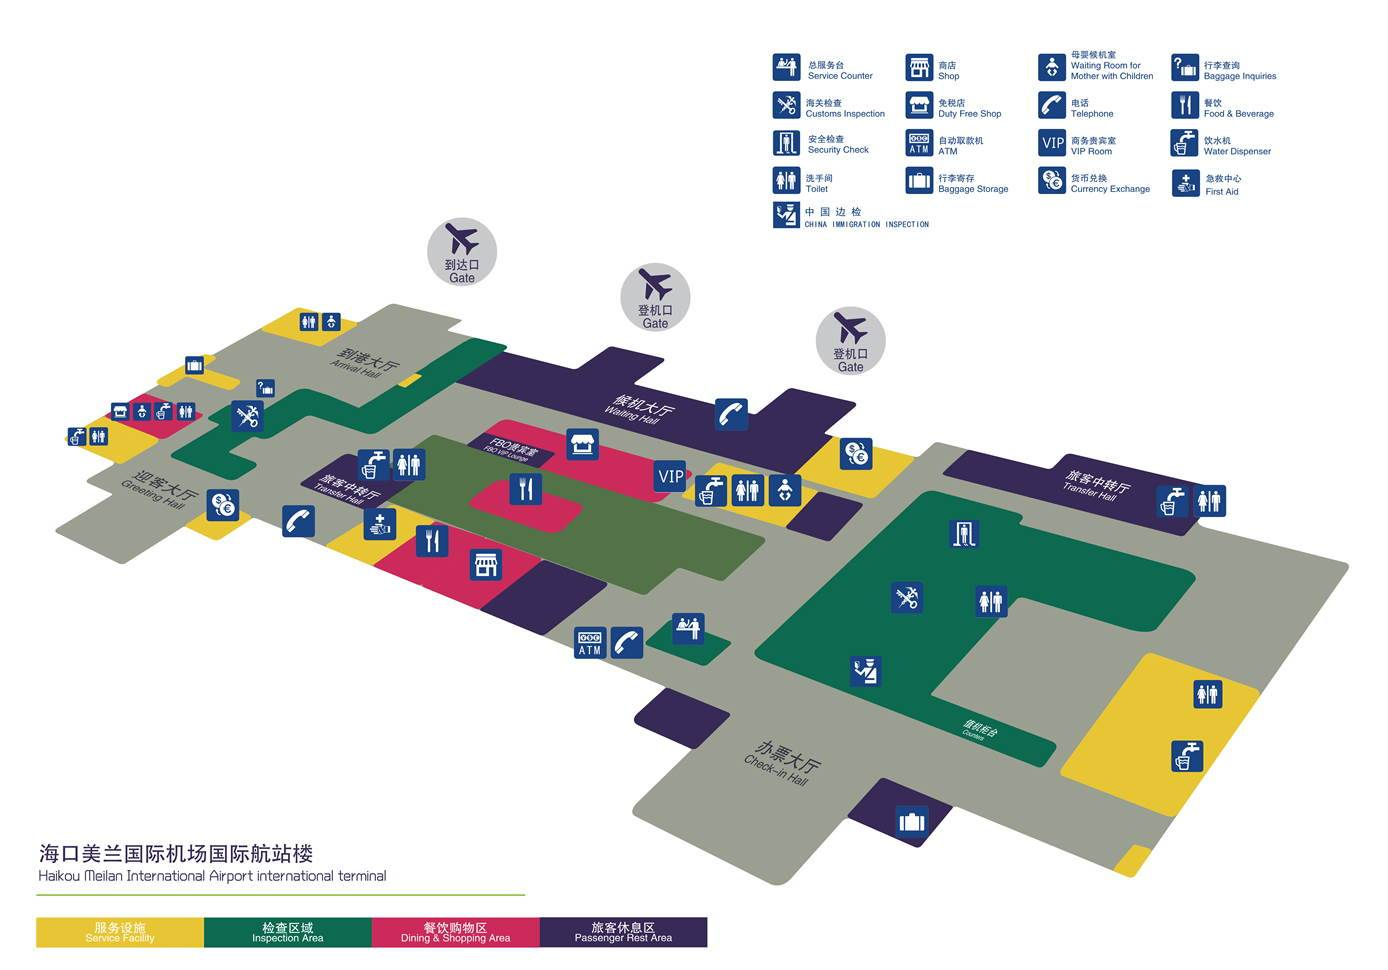 Аэропорт бильбао: схема терминала, расписание, табло, услуги